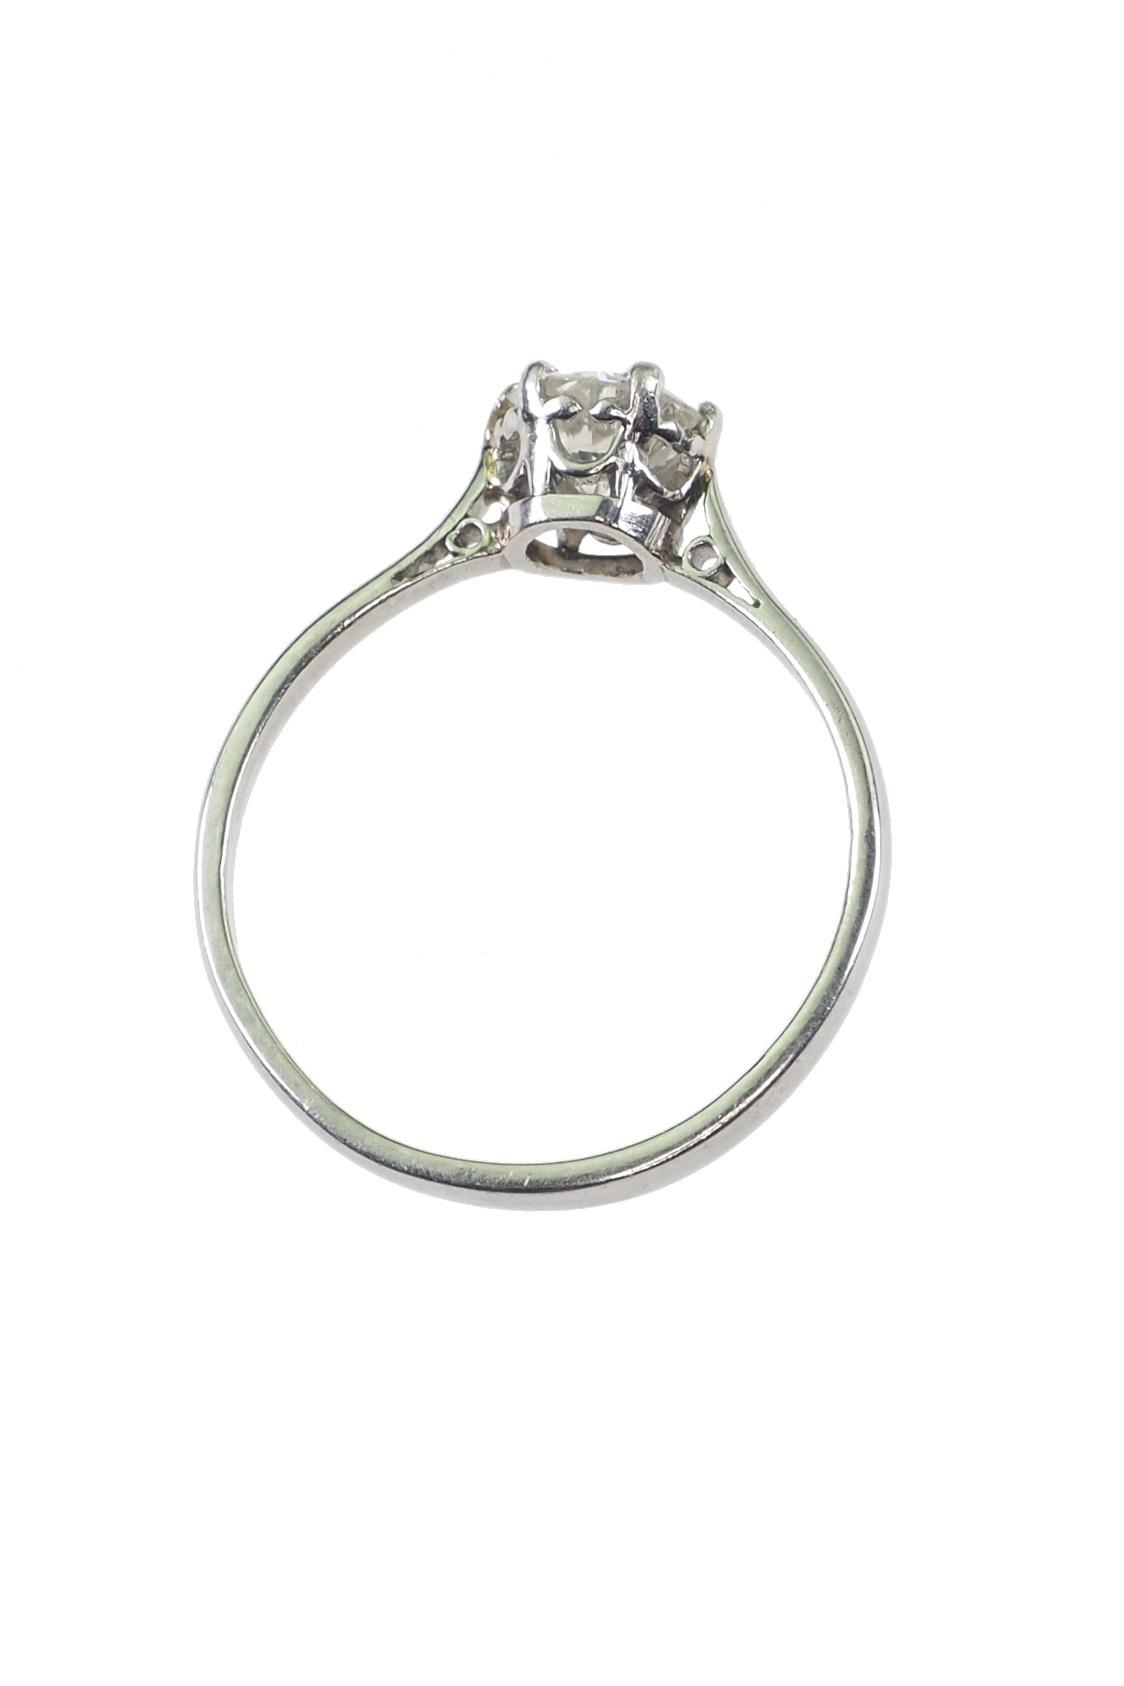 zertifizierten-Diamantschmuck-kaufen-0215c